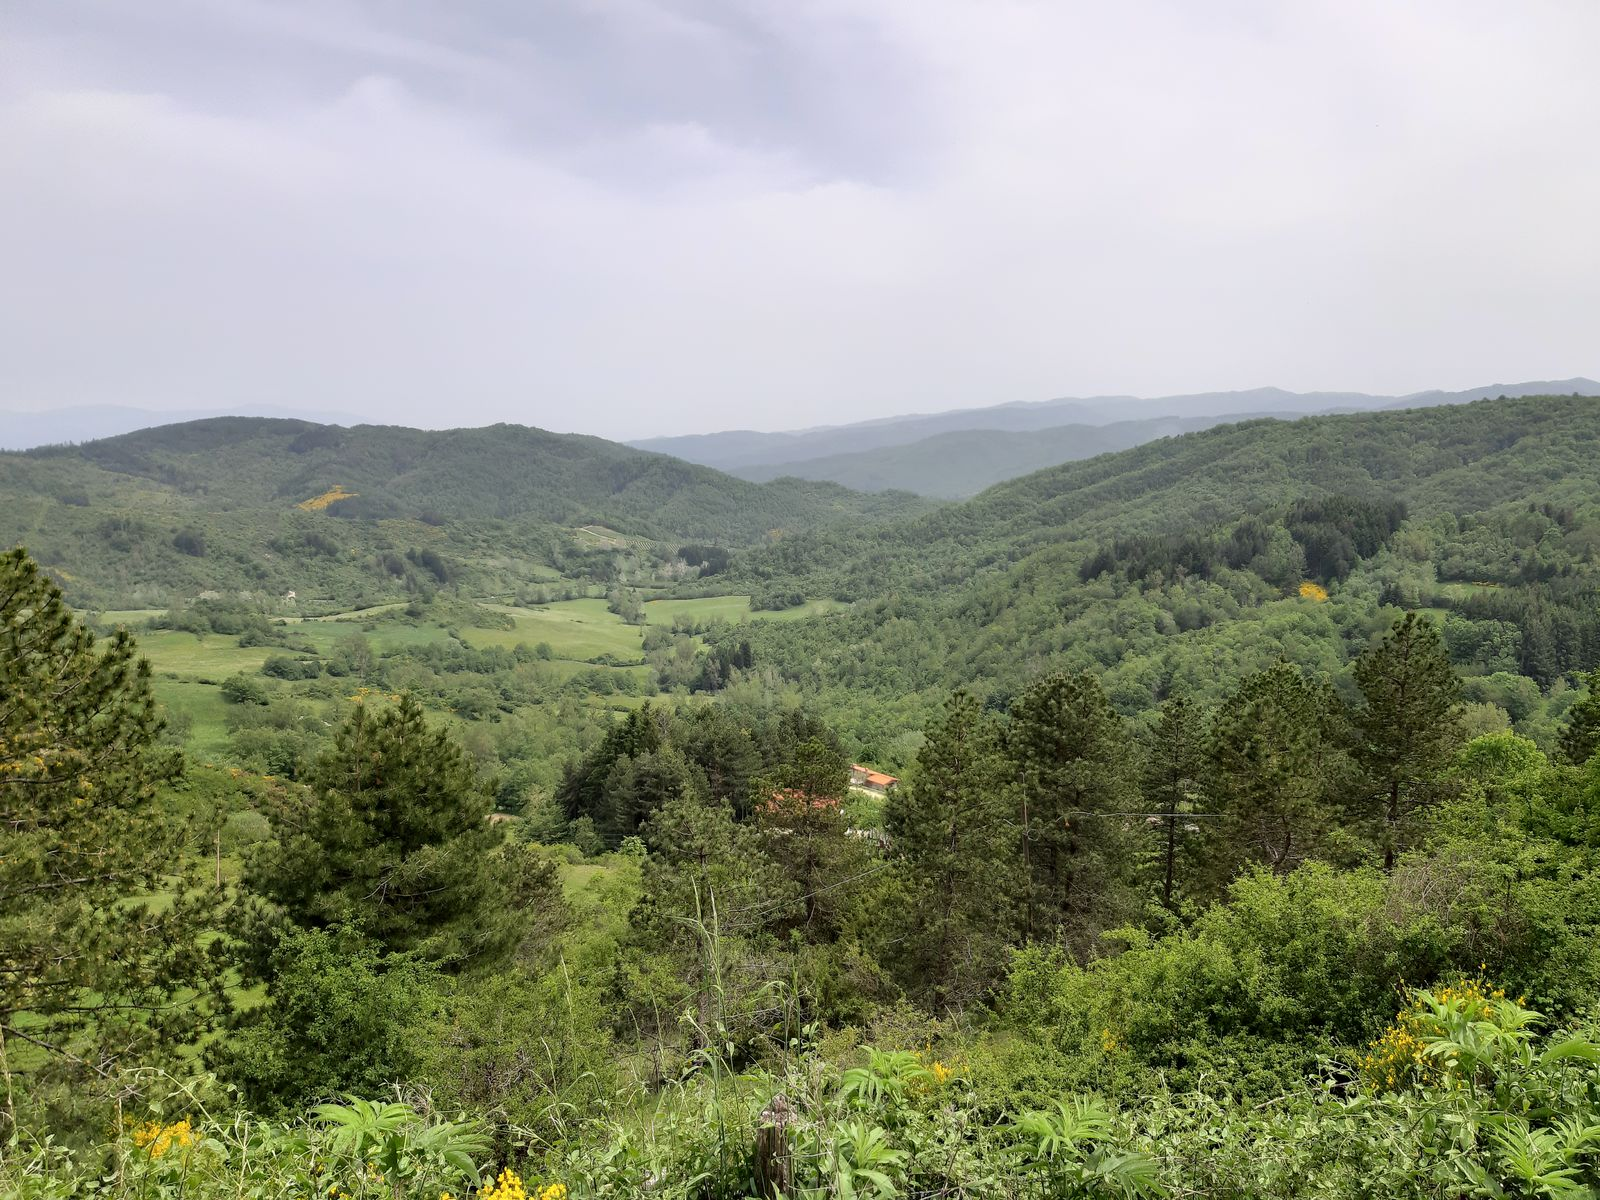 Montemignaio - Hidden land of the Casentino - Tuscany, Beautiful Everywhere